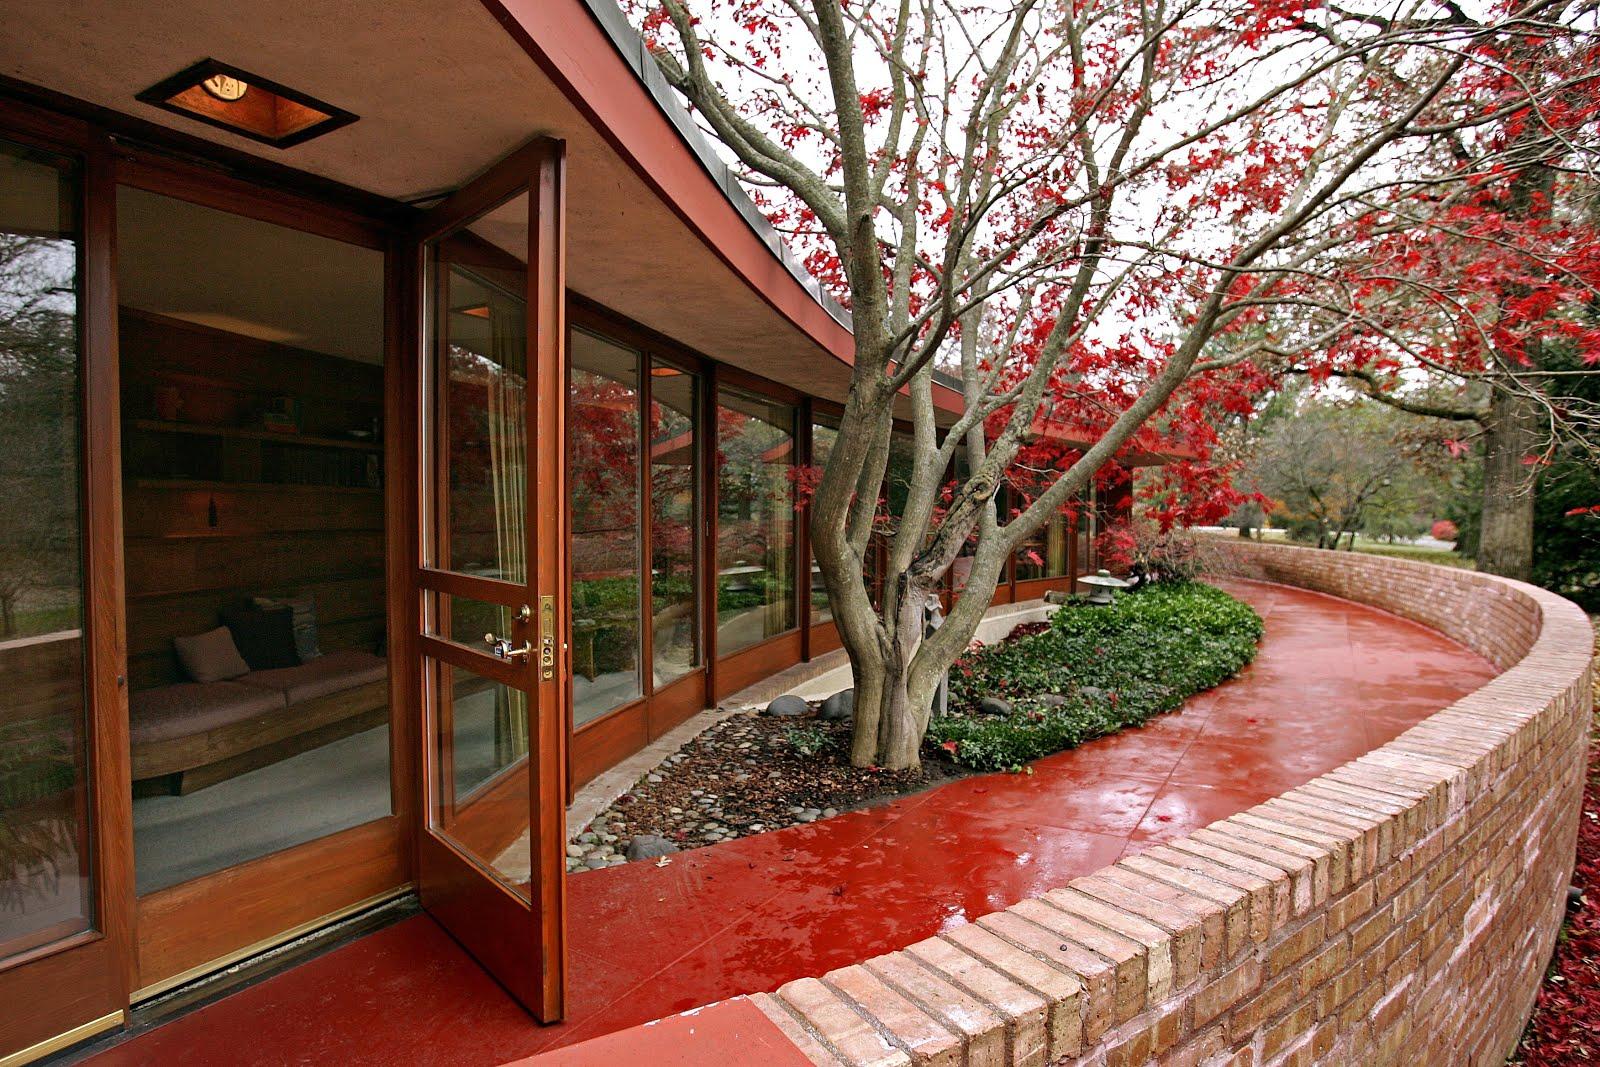 AOTA 2016 Frank Lloyd Wright/Chicago Botanic Gardens with Fred Sammons